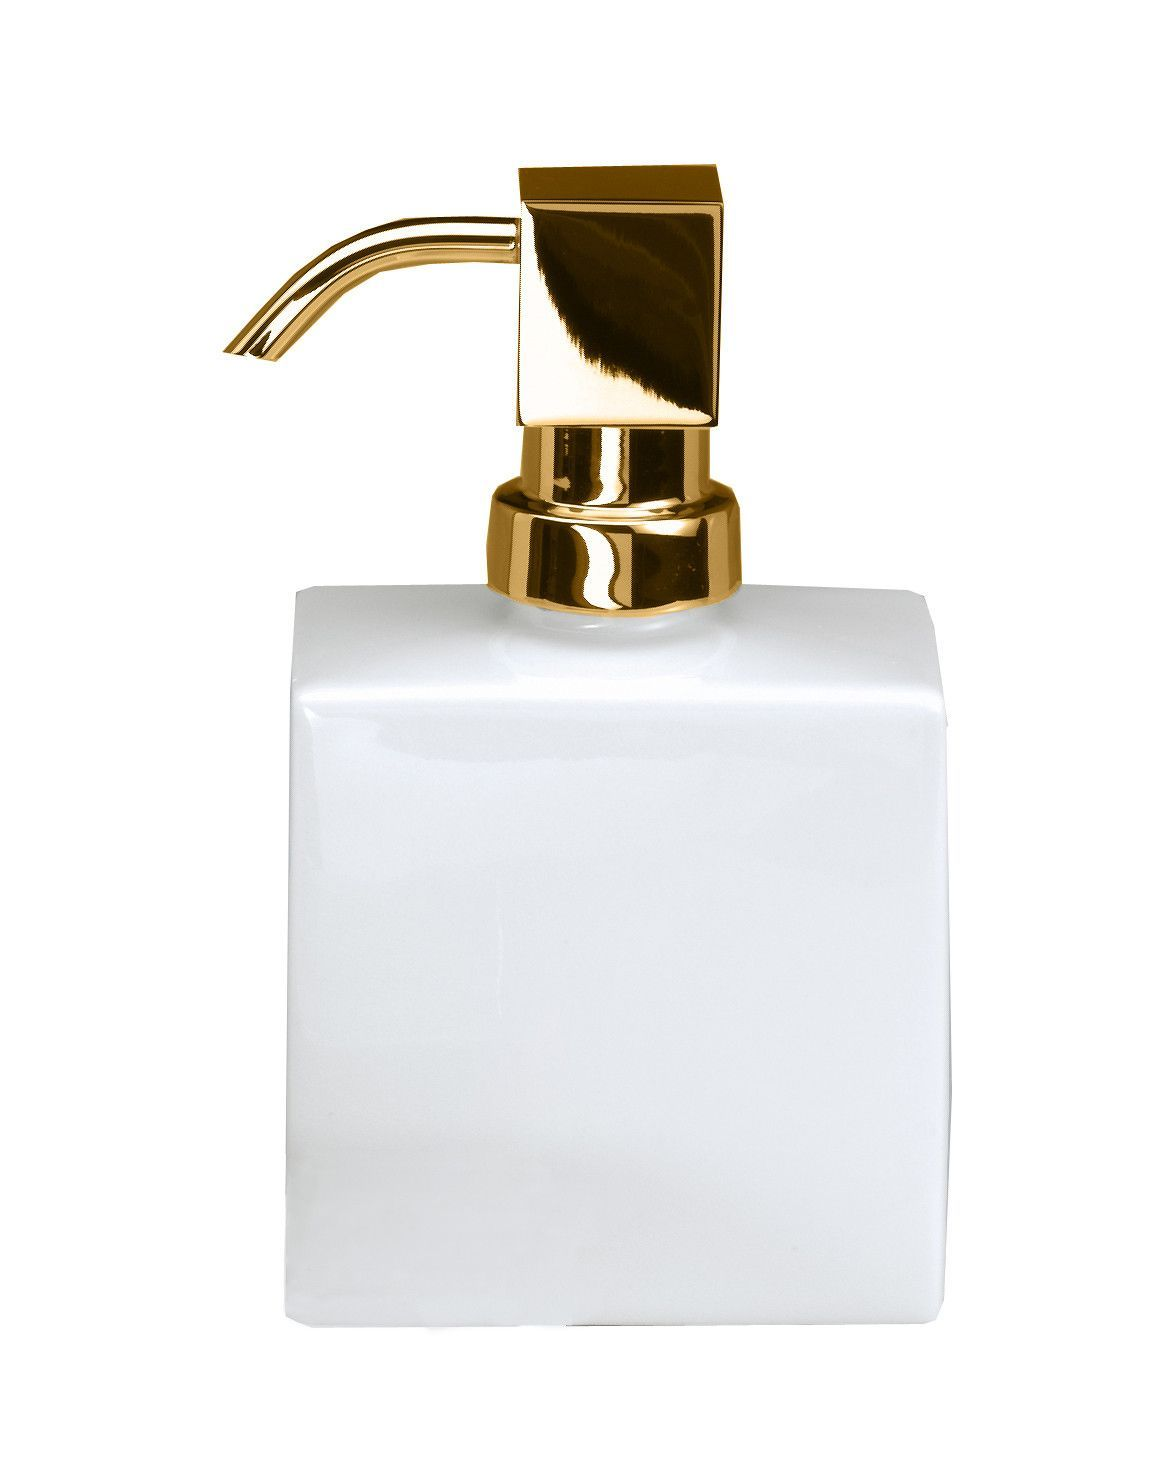 Dwba Soap Lotion Dispenser Pump For Kitchen Bathroom Countertops